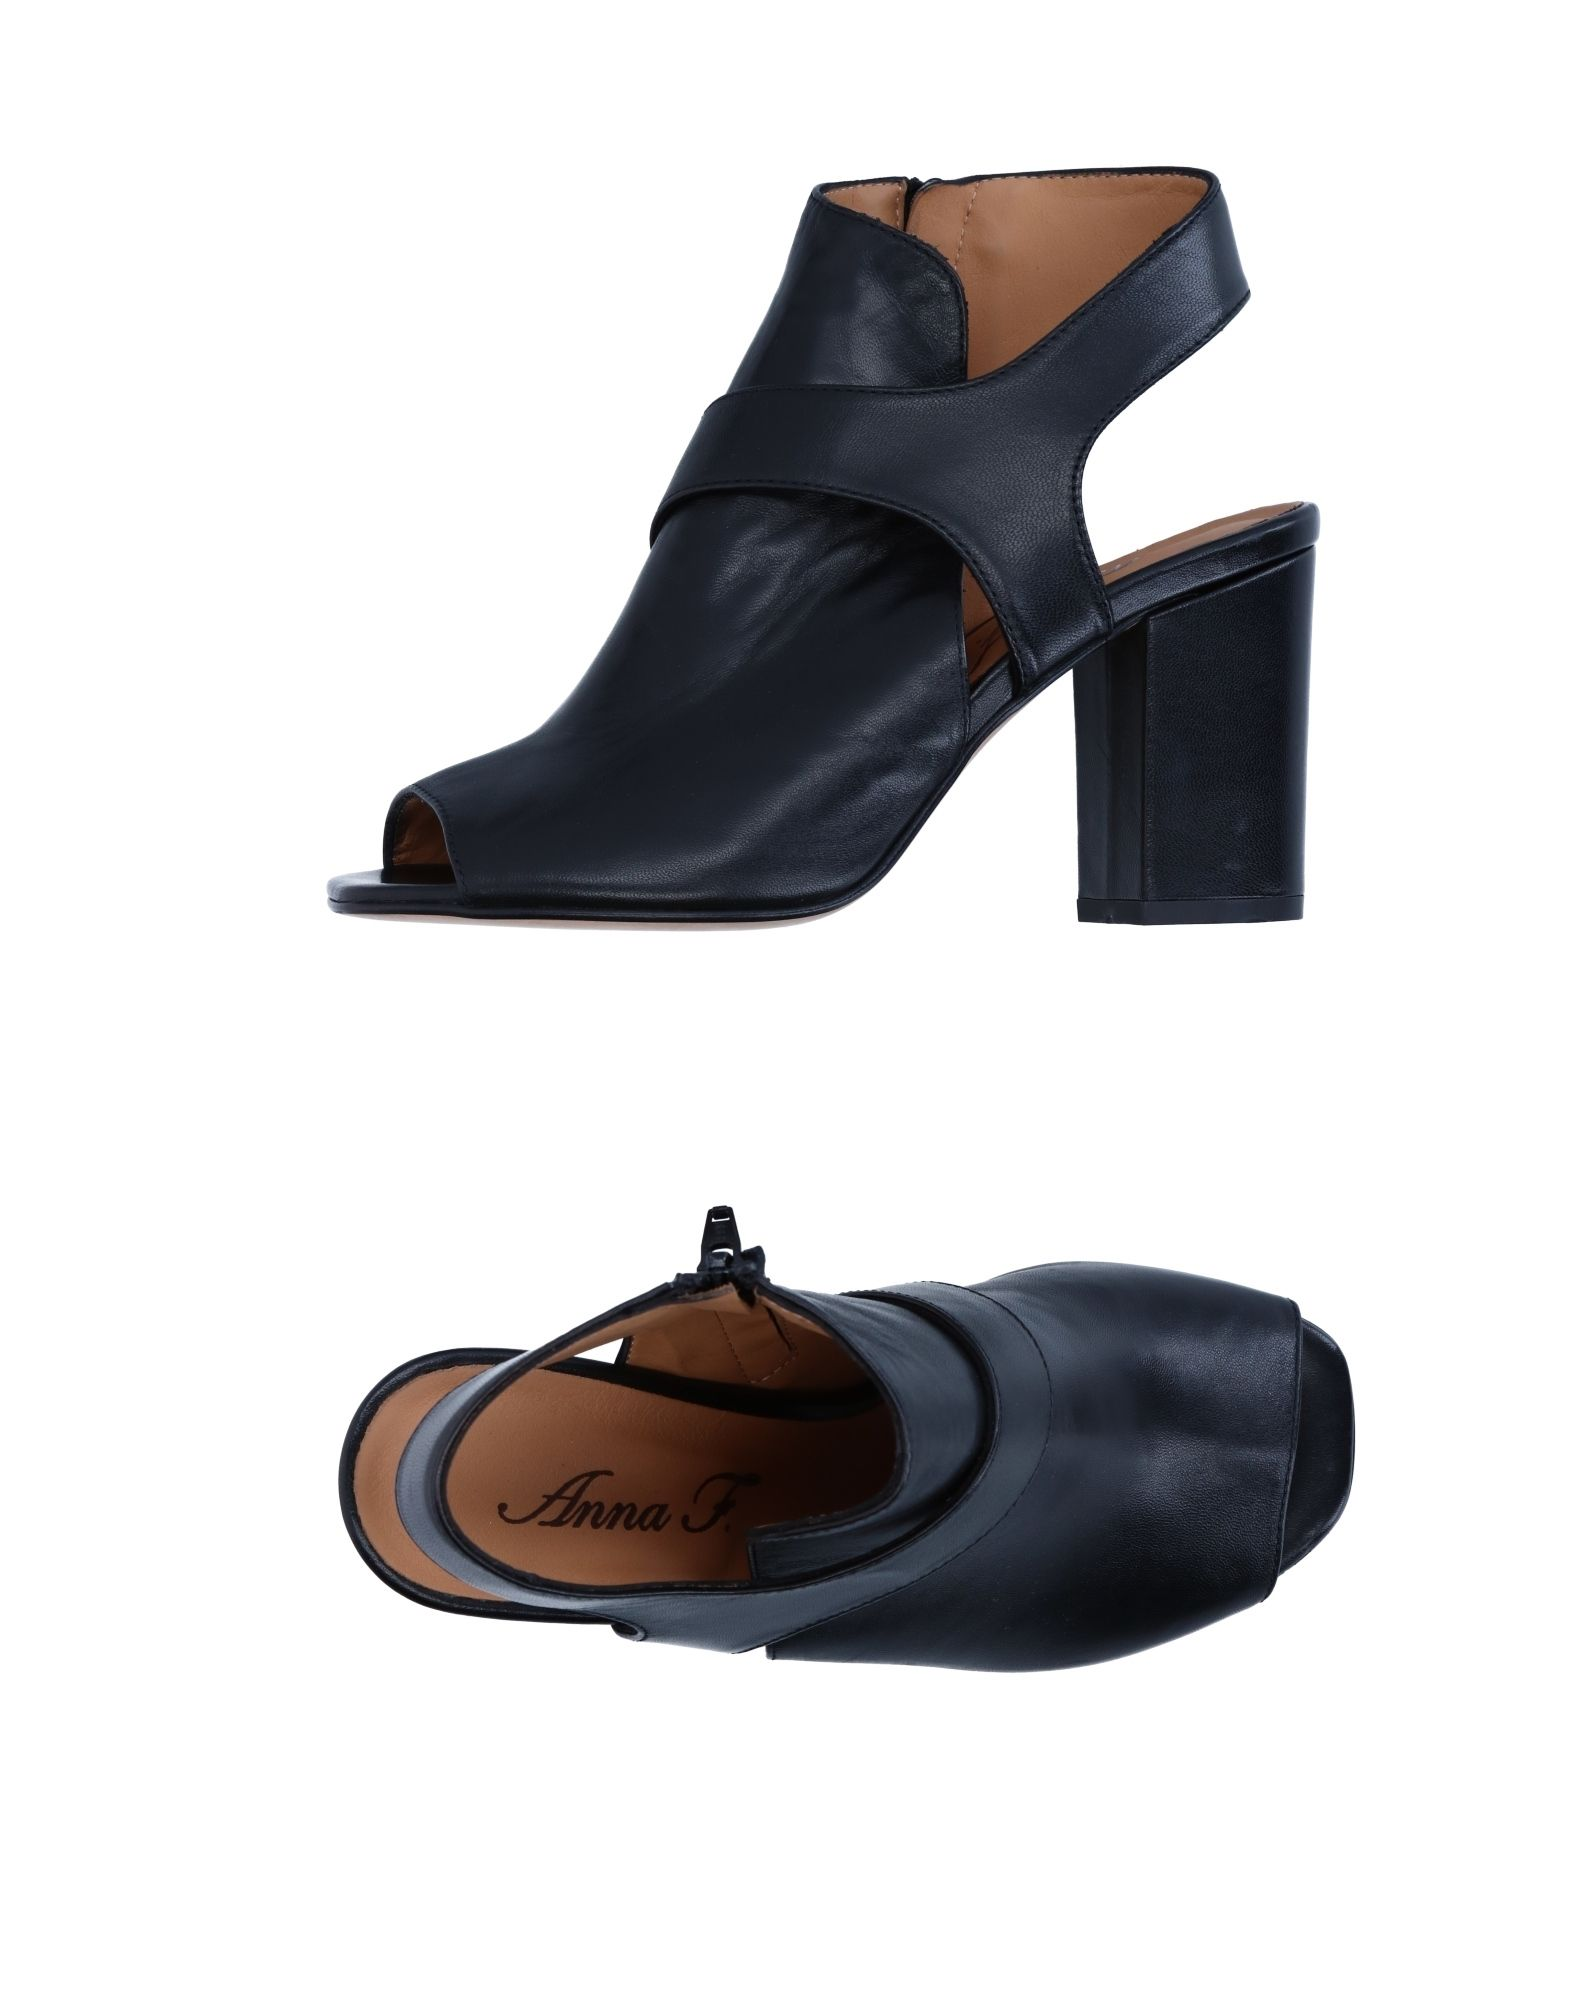 Anna F. Sandalen Damen  11239690RU Gute Qualität beliebte Schuhe